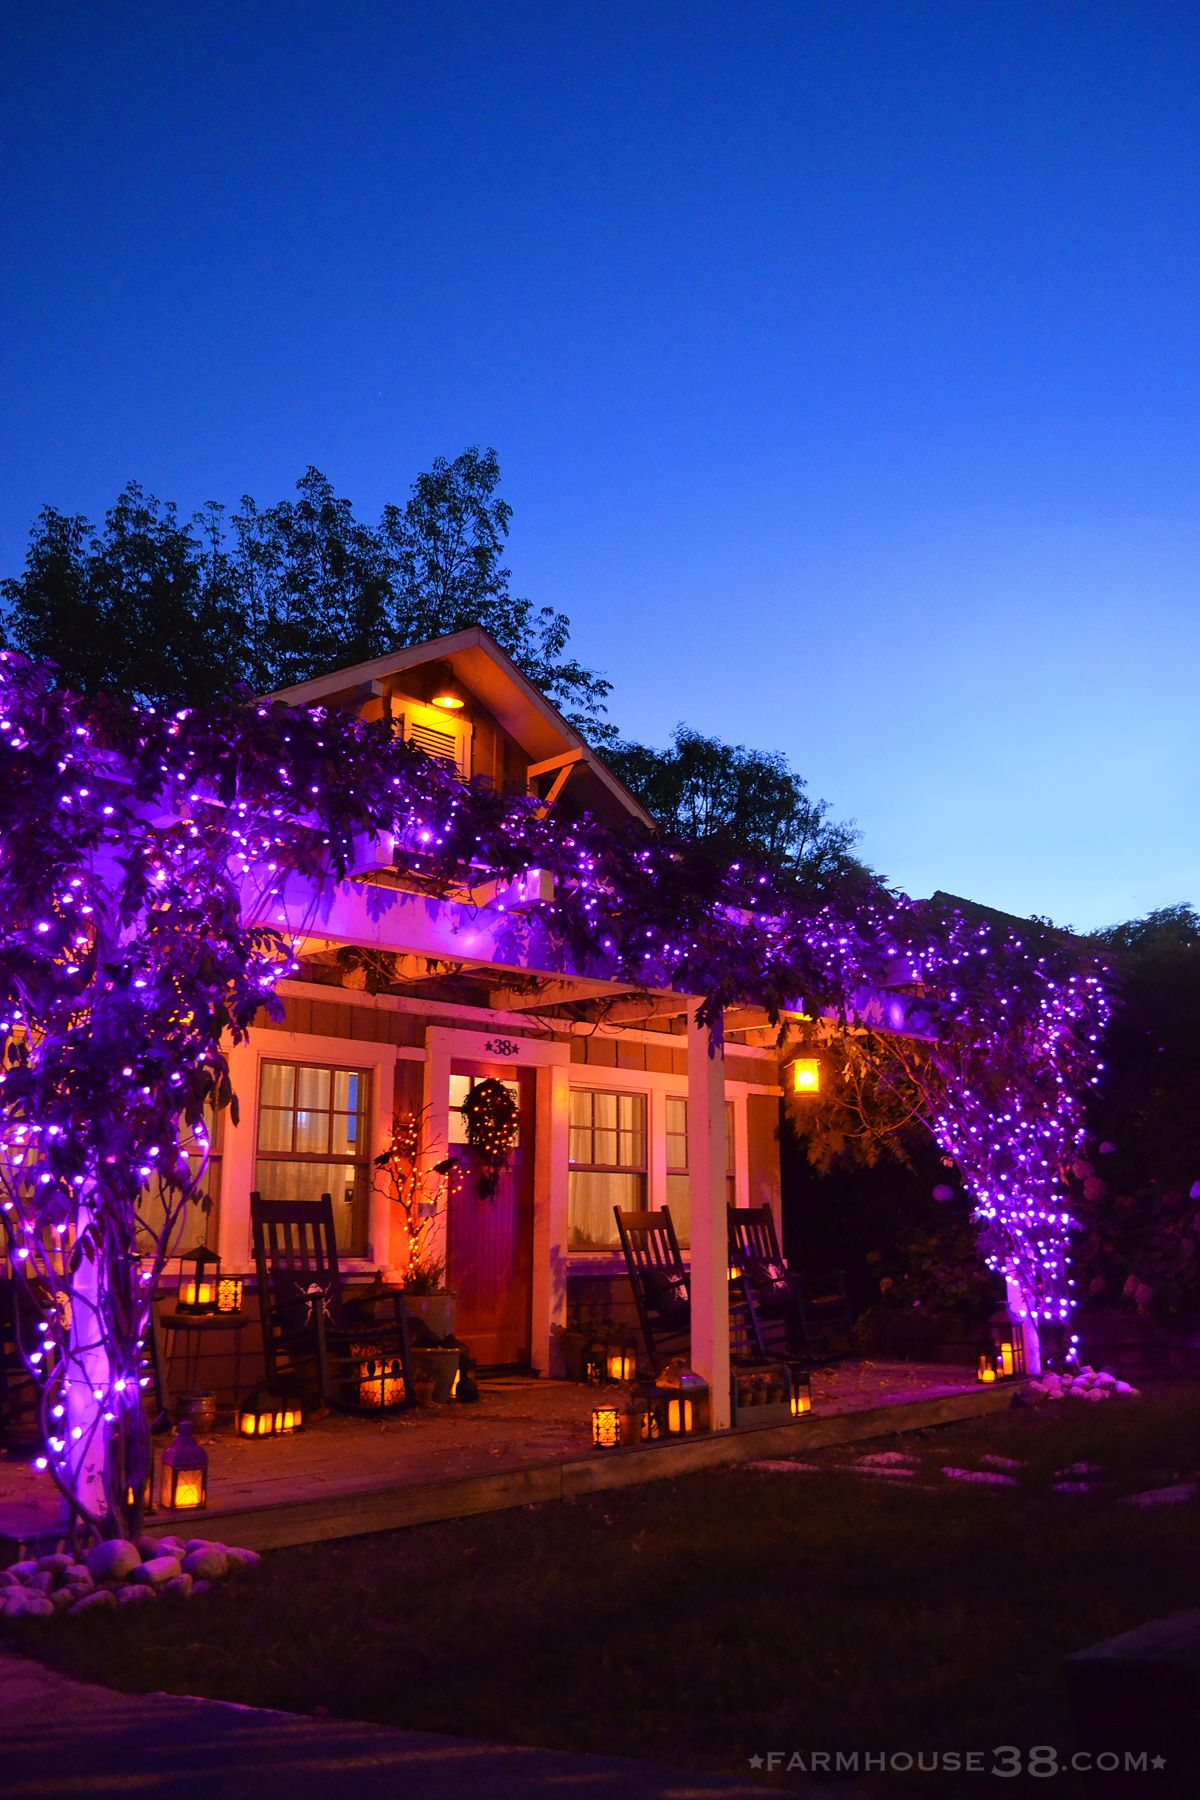 halloween light display at farmhouse38com